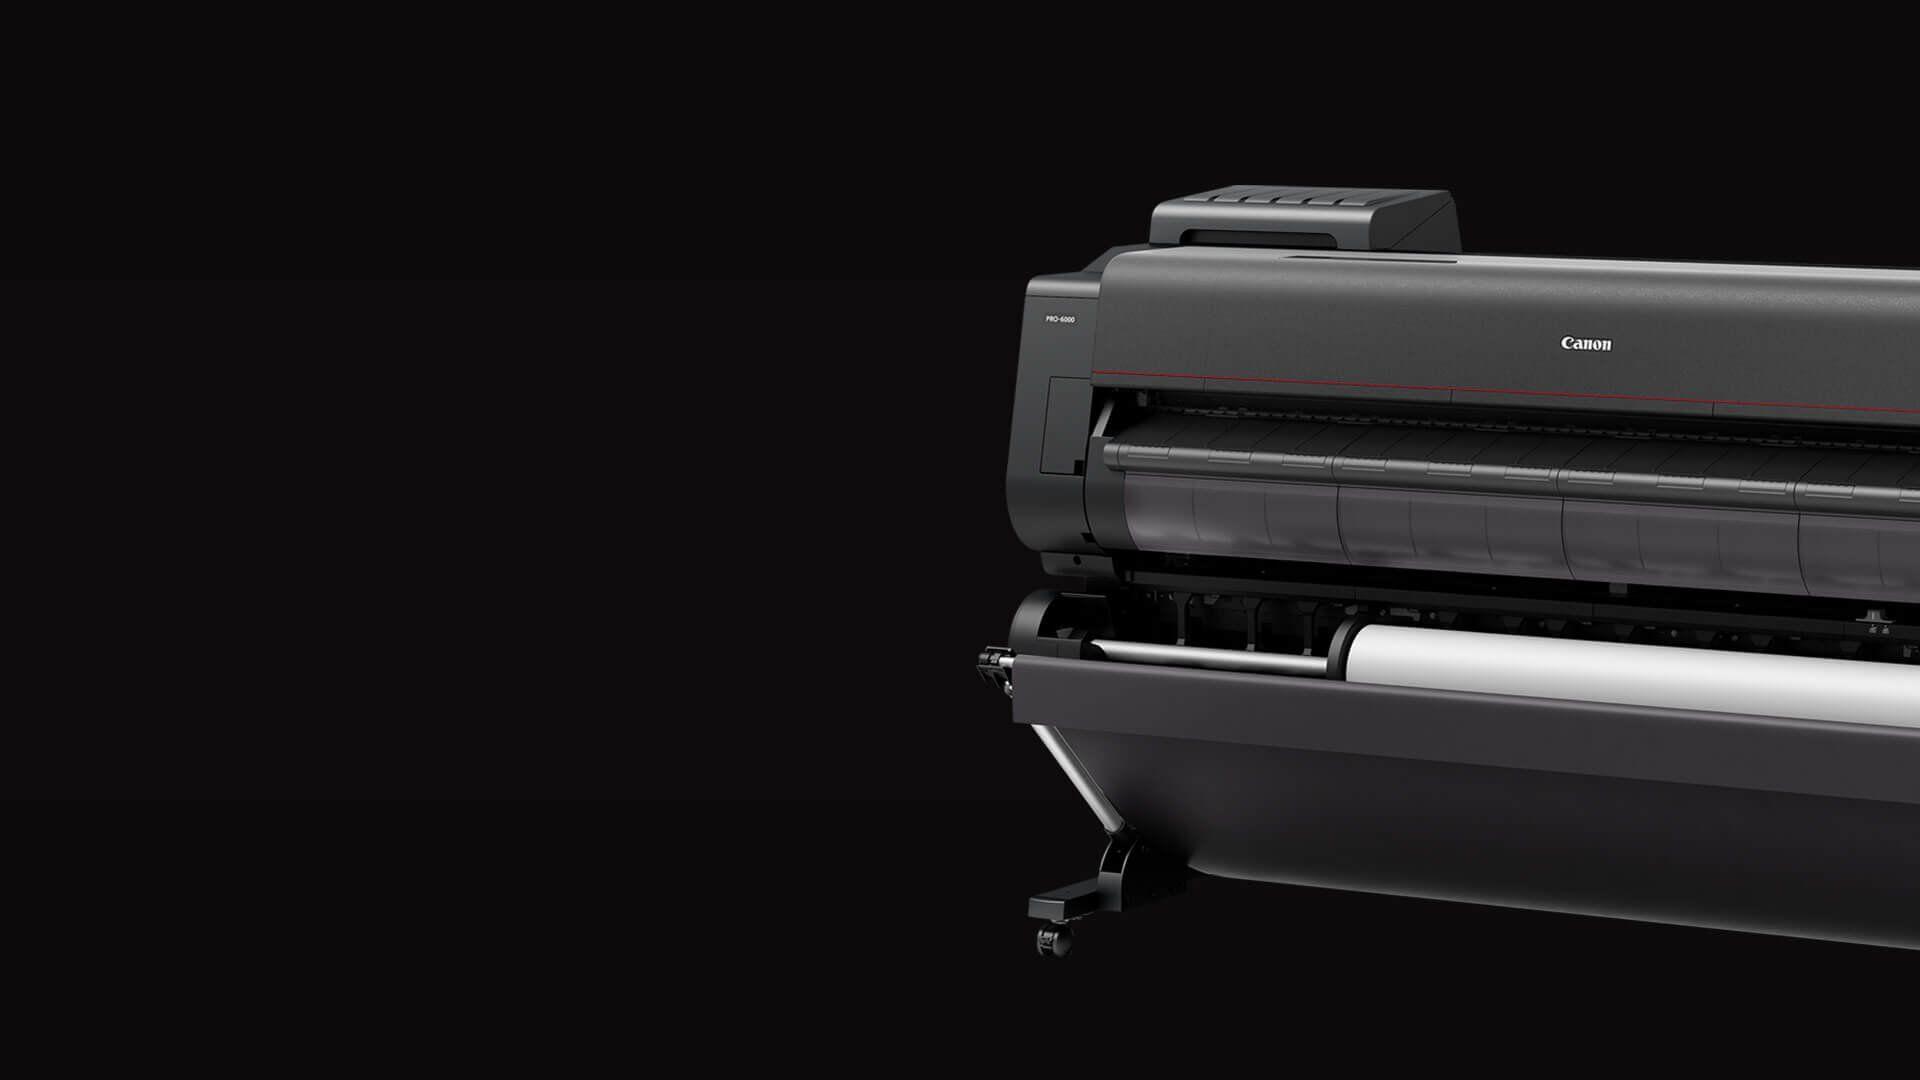 Canon Printer Error Code 1403 - How to fix